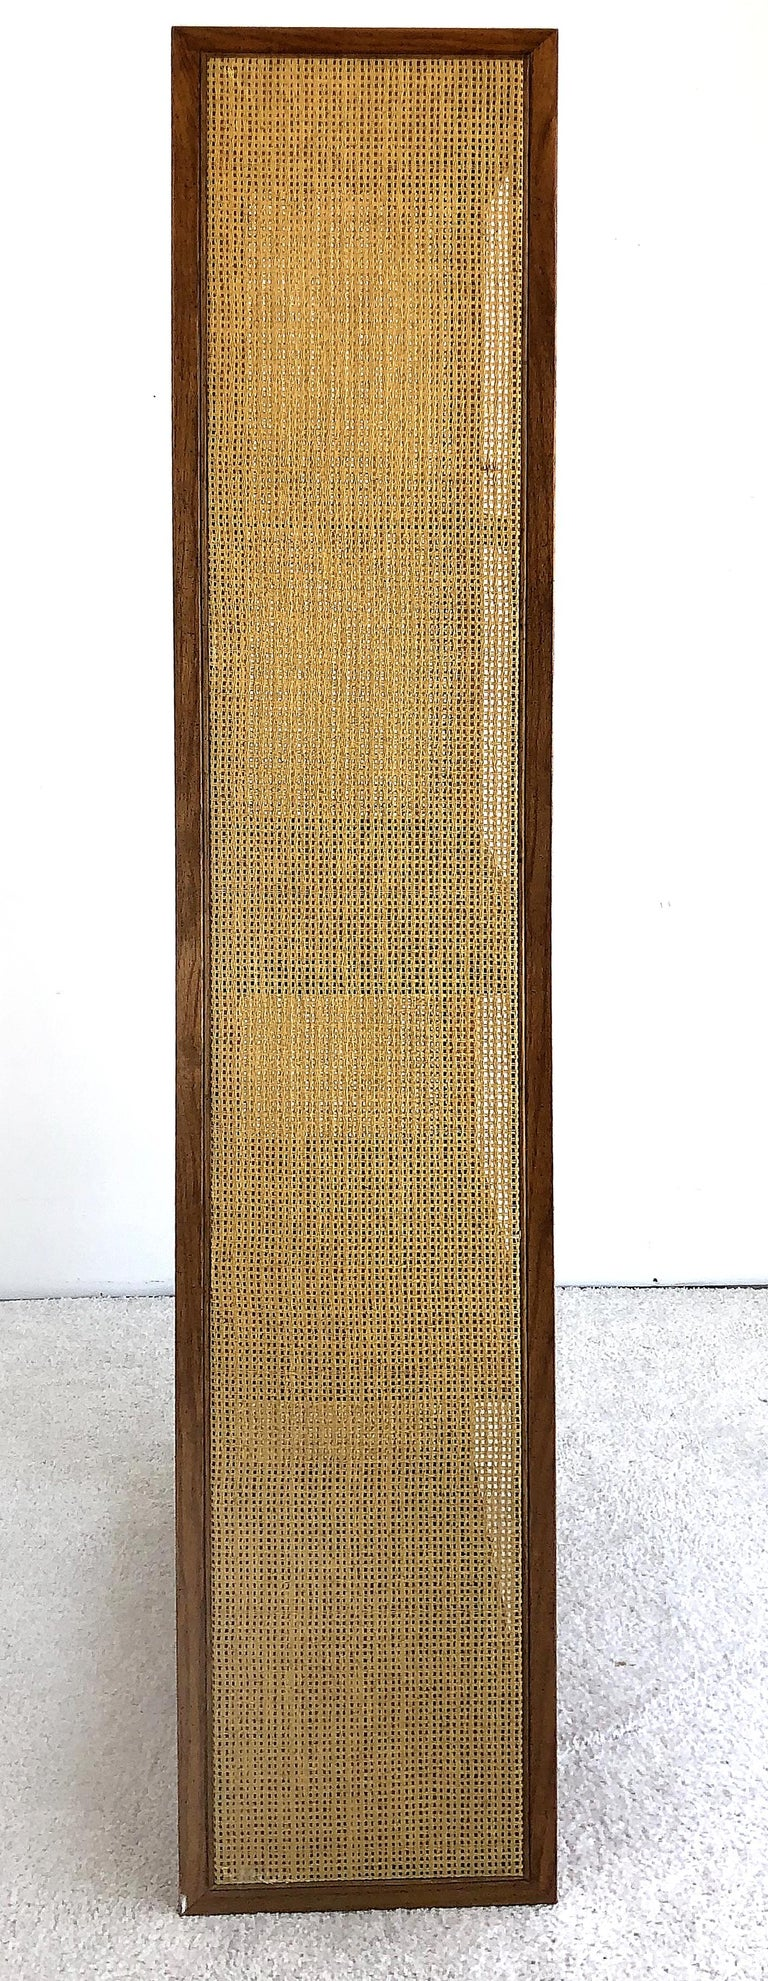 1960s Mid-Century Modern Dunbar Style Bookcase In Good Condition In Miami, FL